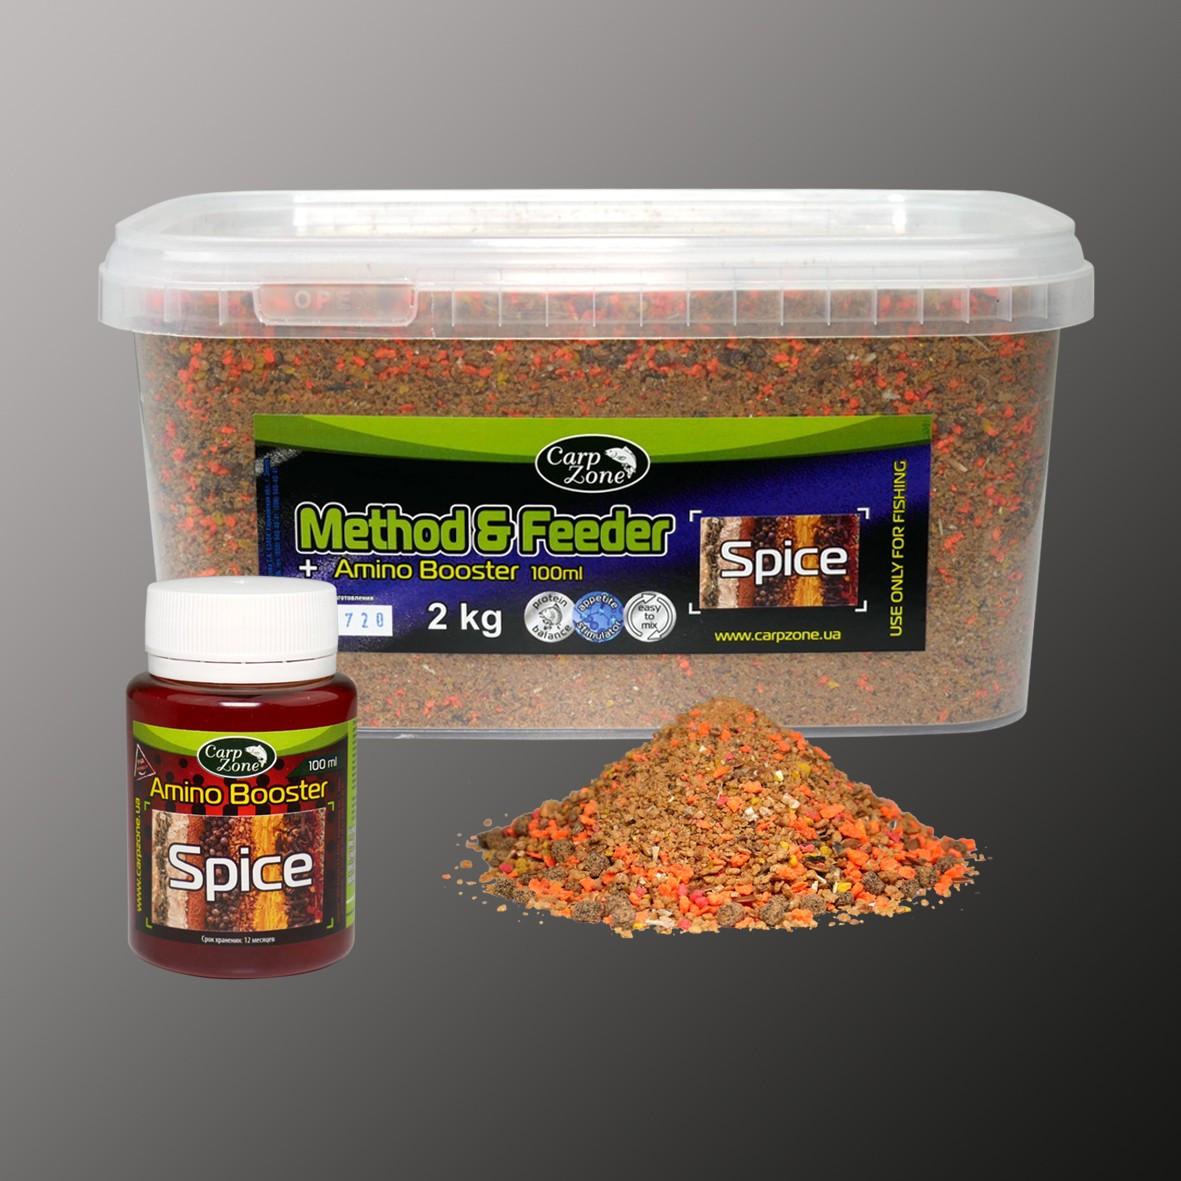 Набор Set Method & Feeder Spice (Специи) 2kg + Amino Booster Spice 100ml